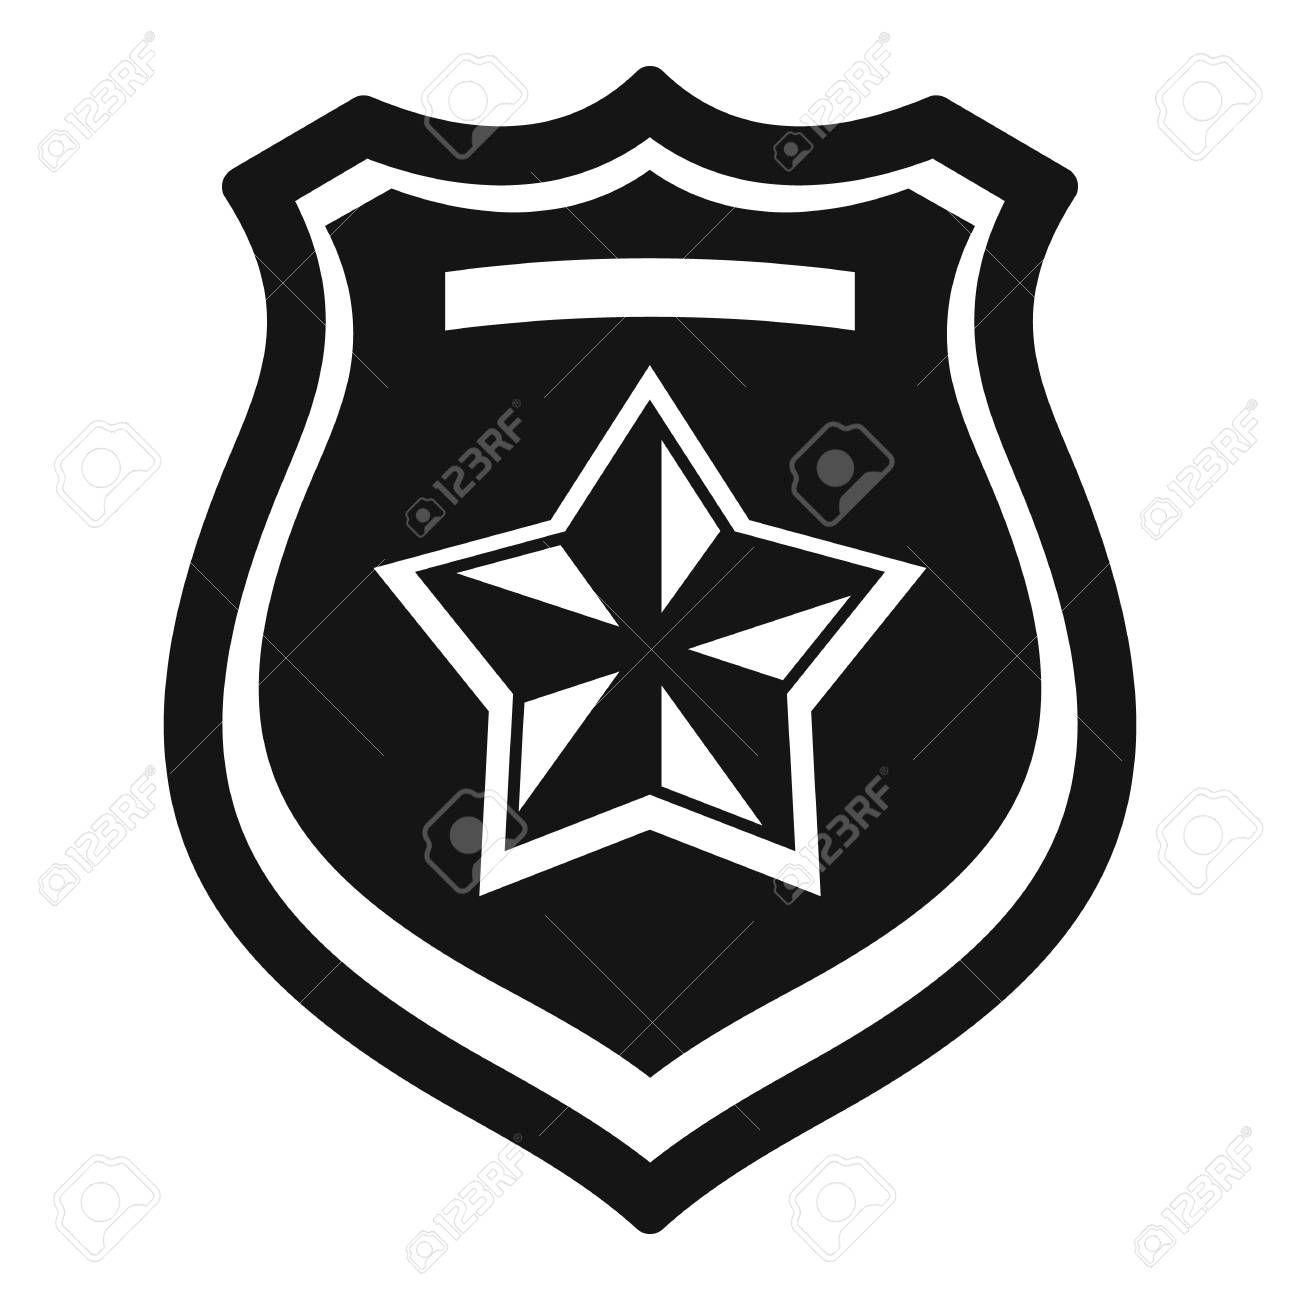 Police Emblem Icon Simple Style Illustration Affiliate Icon Emblem Police Illustration Style Style Fashion Illustration Illustration